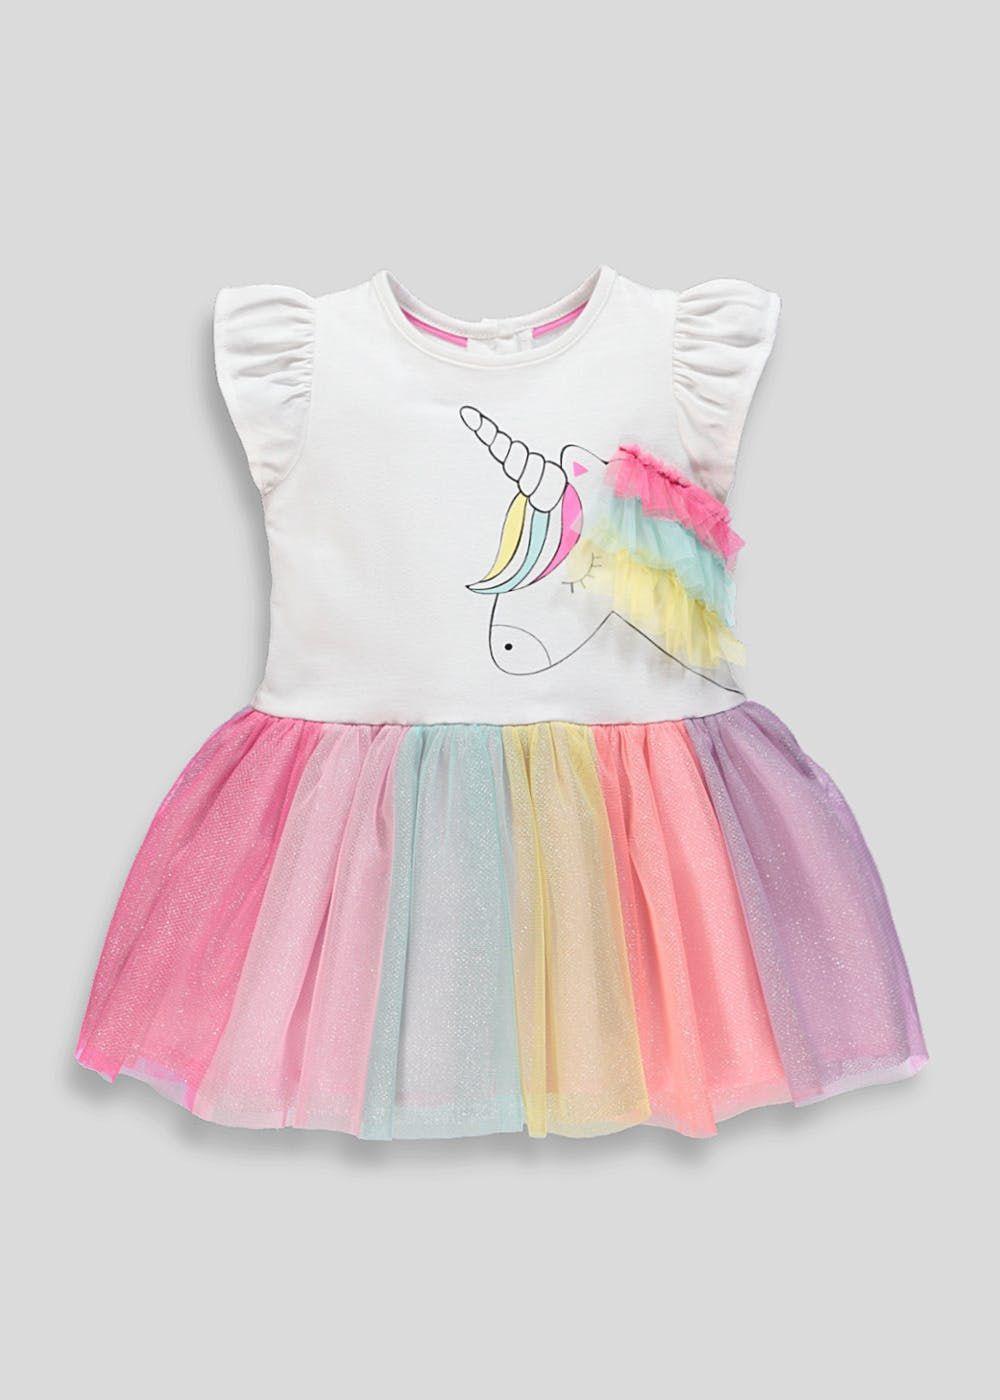 5ecd8b1d5fd25 Girls Unicorn Tutu Dress (9mths-6yrs) – Multi | Baby girls | Tutu ...